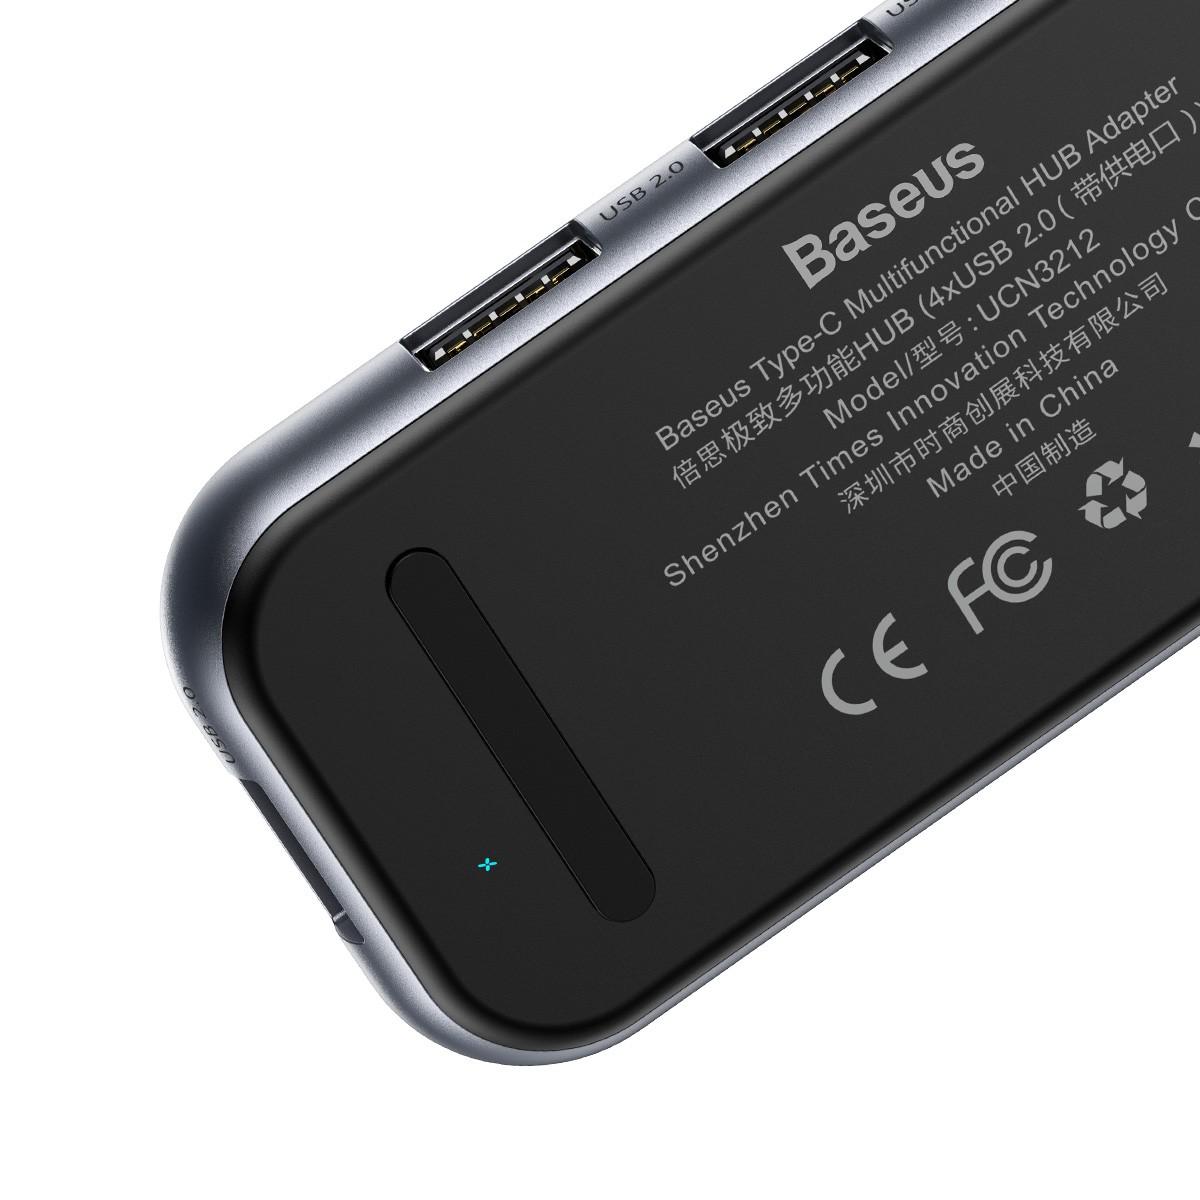 Hub Adaptador Baseus Multi-Funcional (Type-C to 4x USB 2.0)